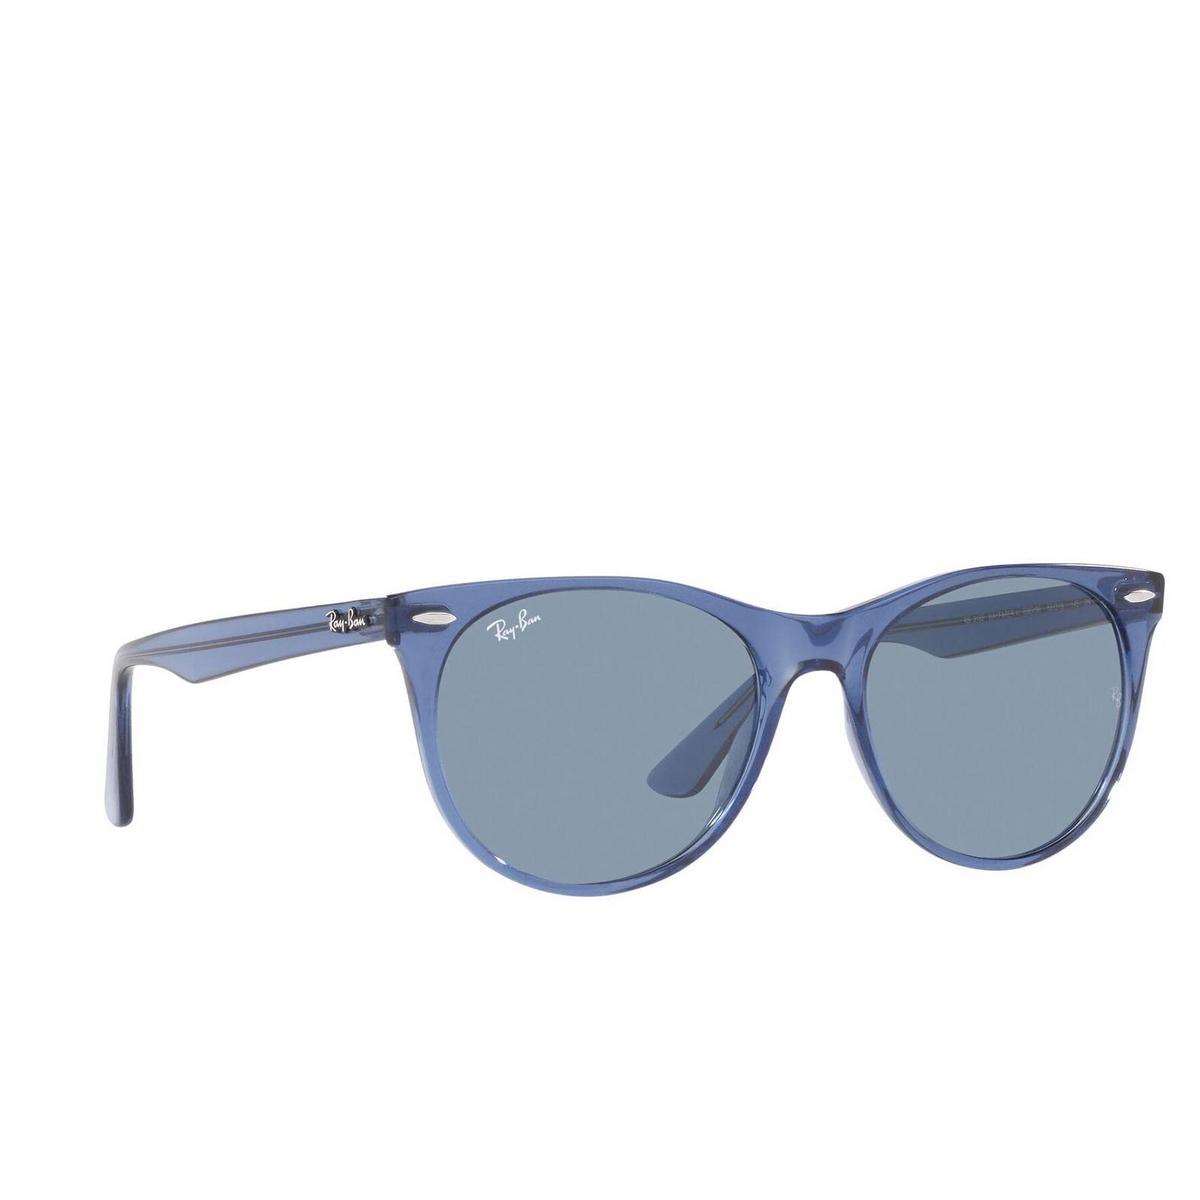 Ray-Ban® Square Sunglasses: Wayfarer Ii RB2185 color True Blue 658756.